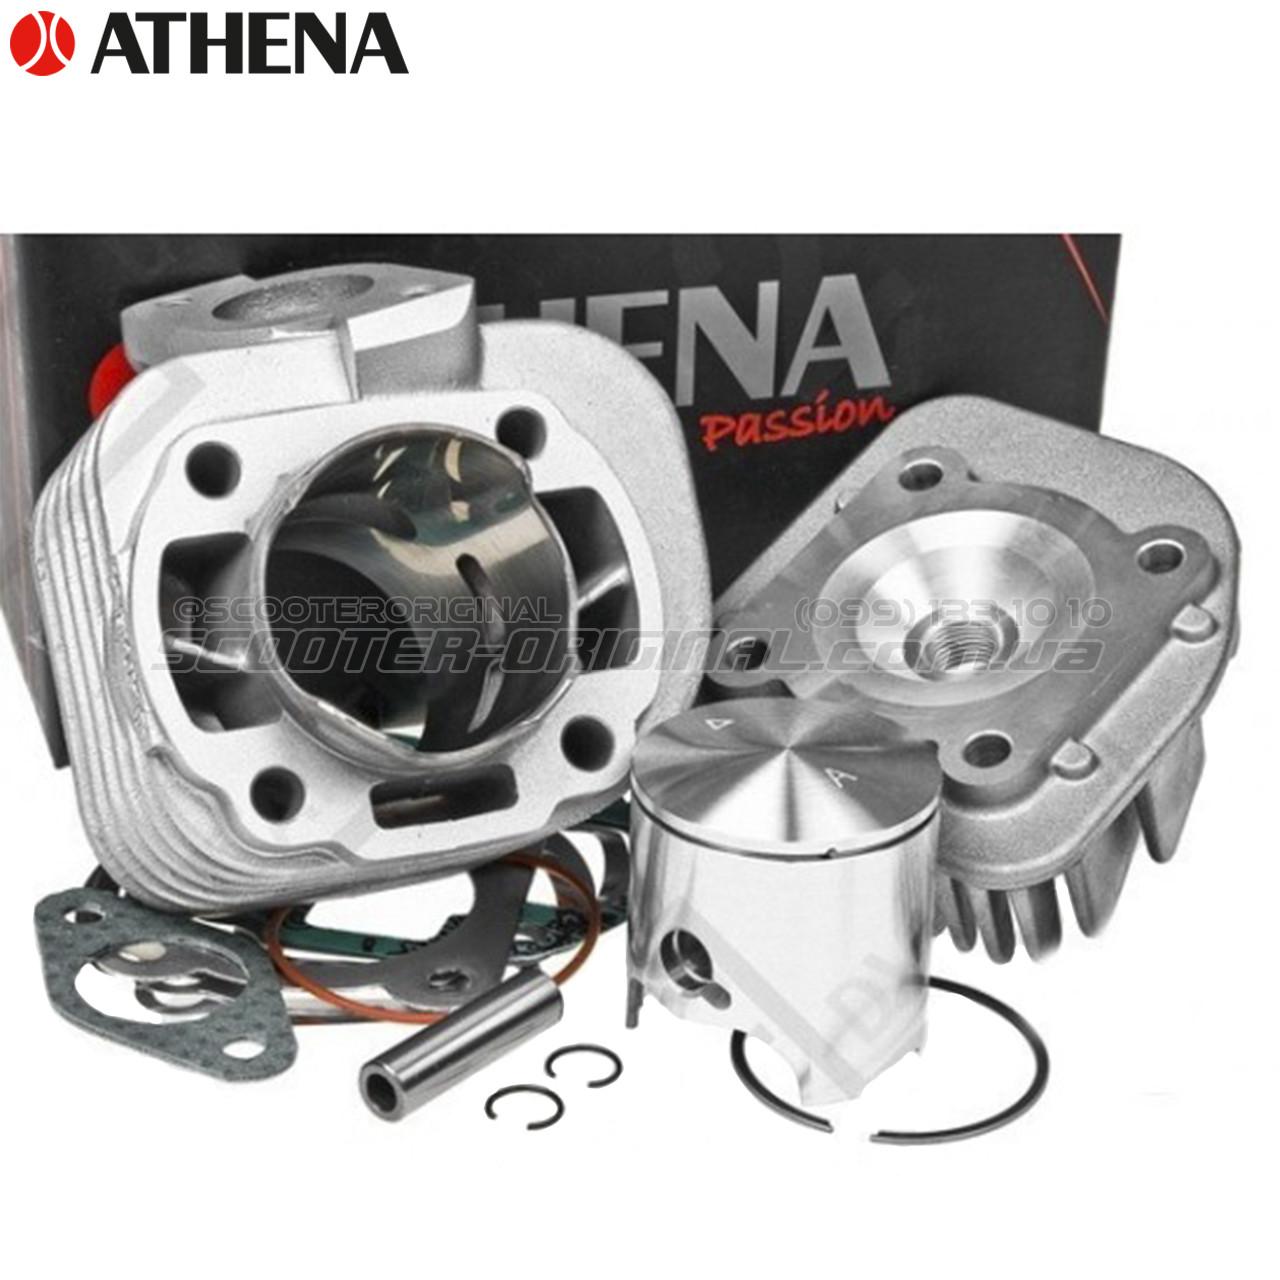 ЦПГ ATHENA SPORT 70cc Minarelli Horizontal AIR (Yamaha) палец Ø 10 мм